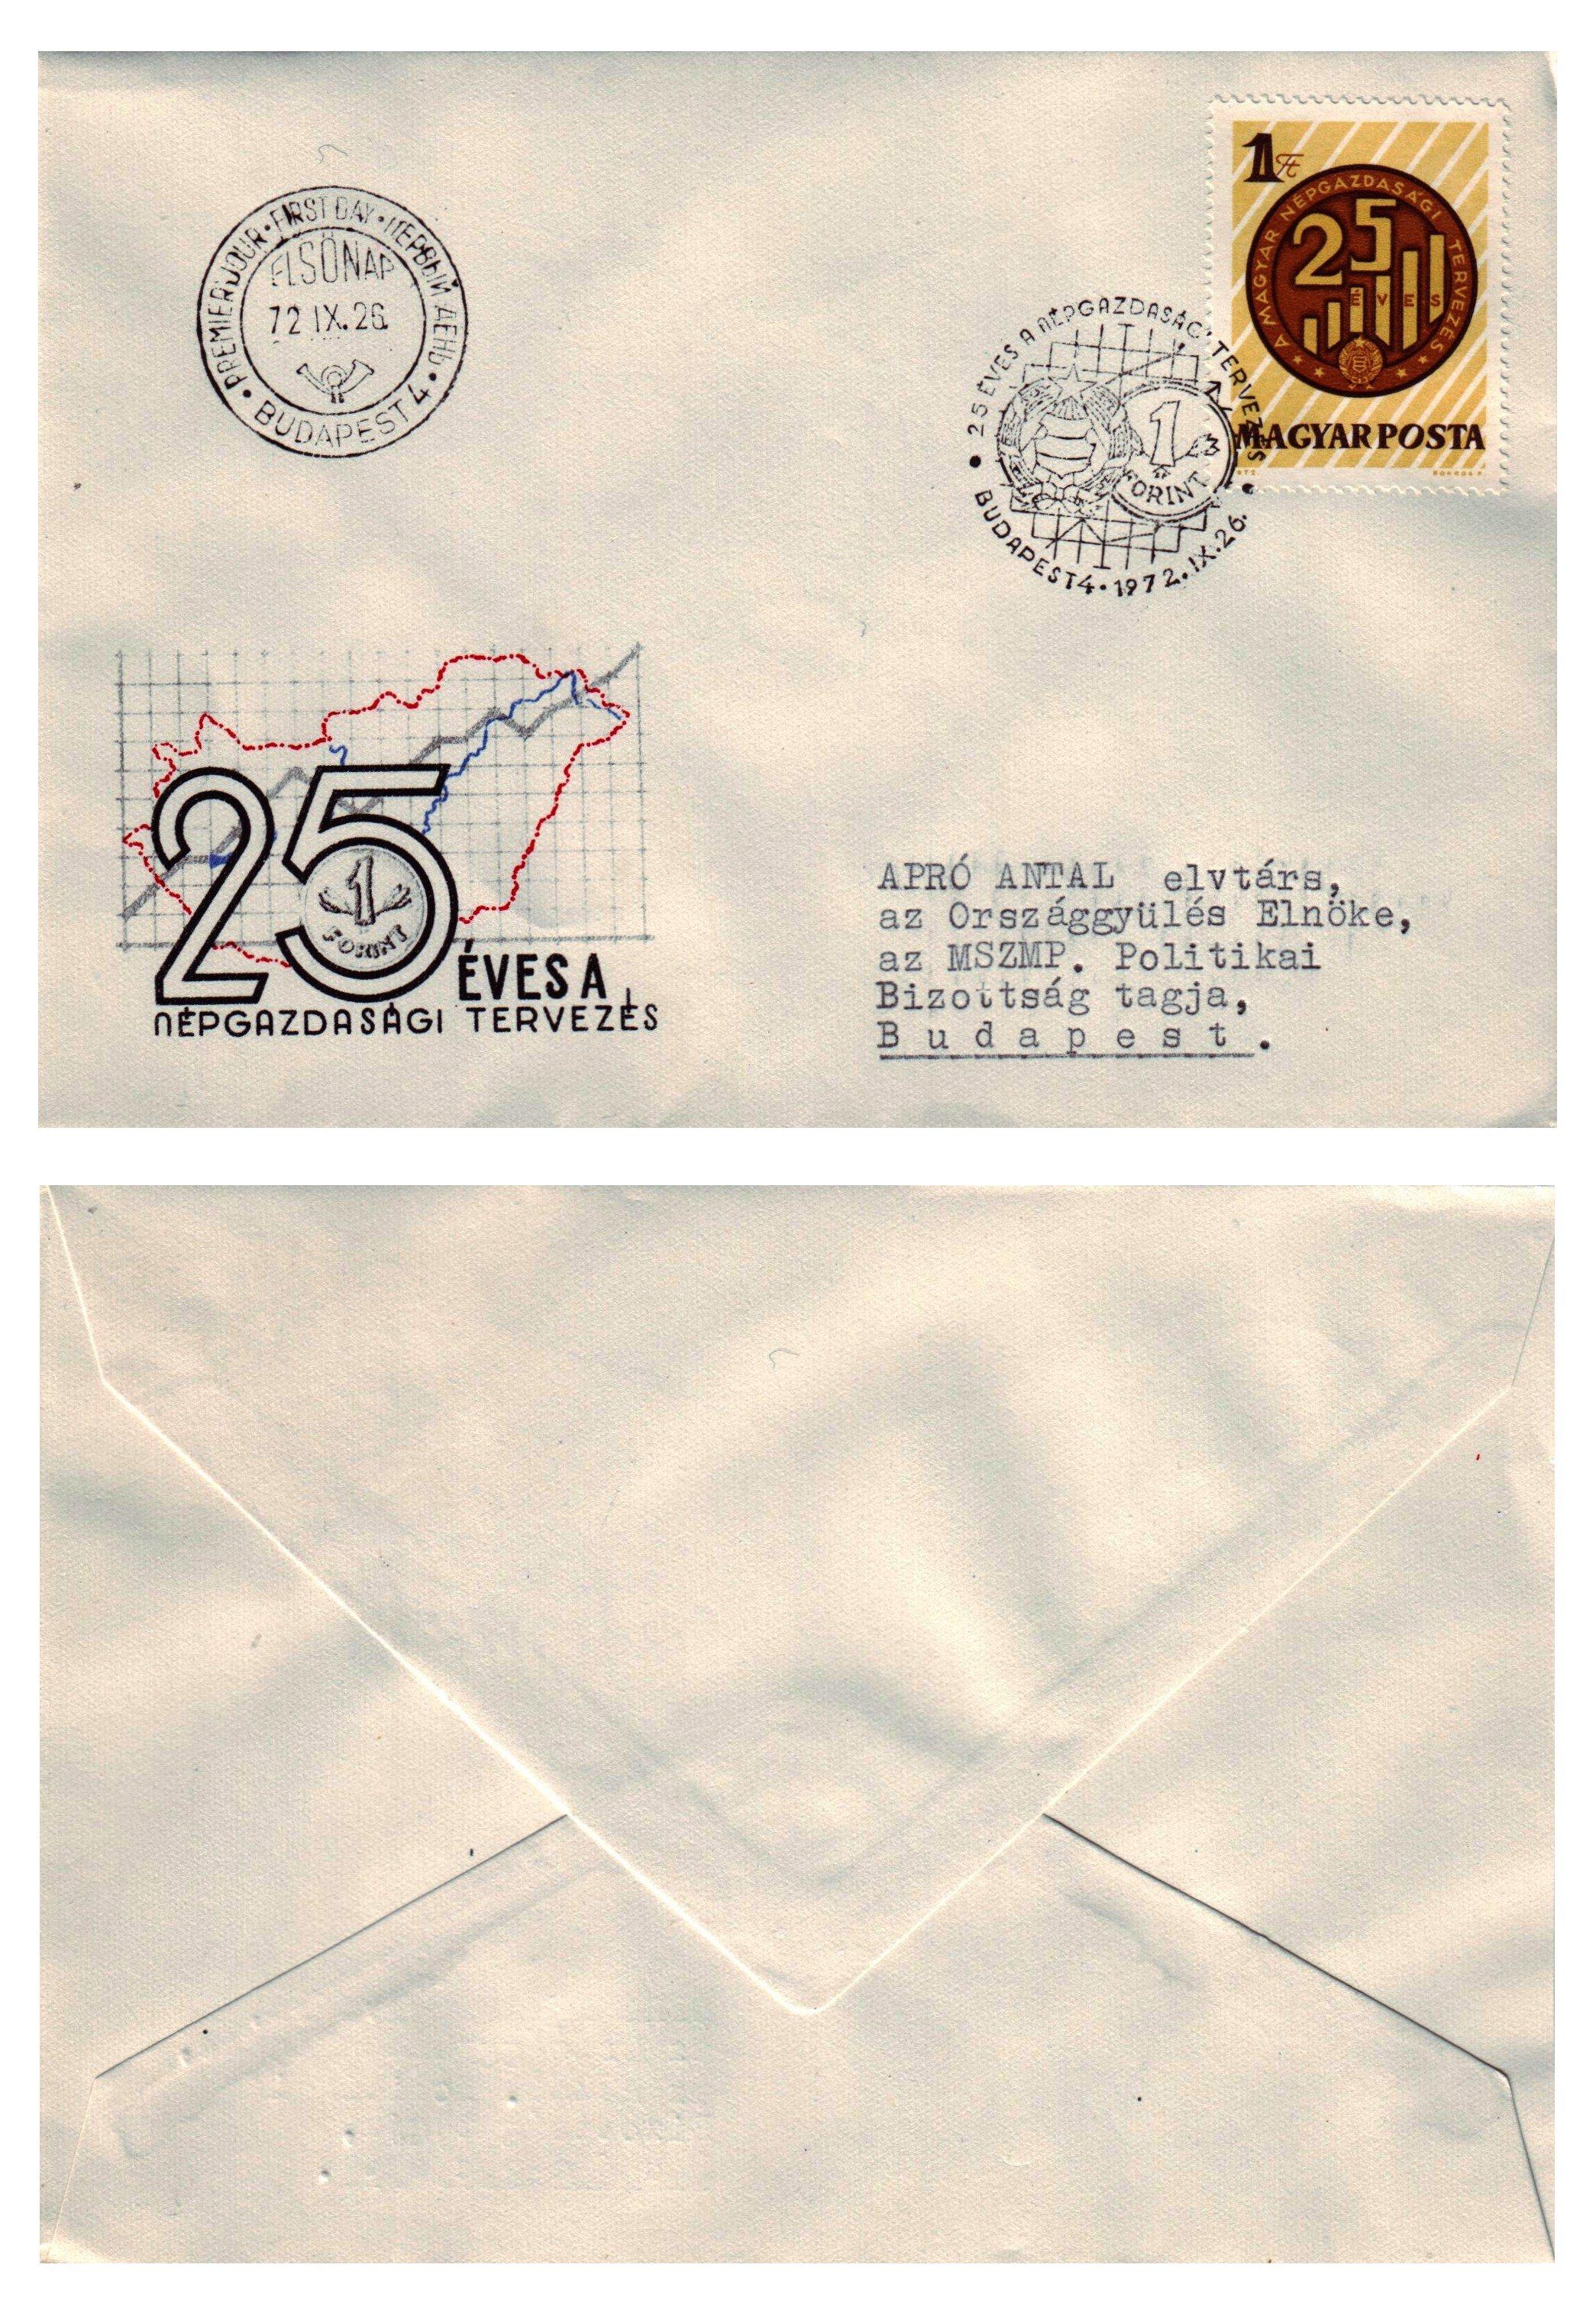 http://www.forintportal.hu/elsonapiboritek/www_forintportal_hu_elsonapi_boritek_25eves_a_nepgazdasagi_tervezes_1972_nagy.jpg